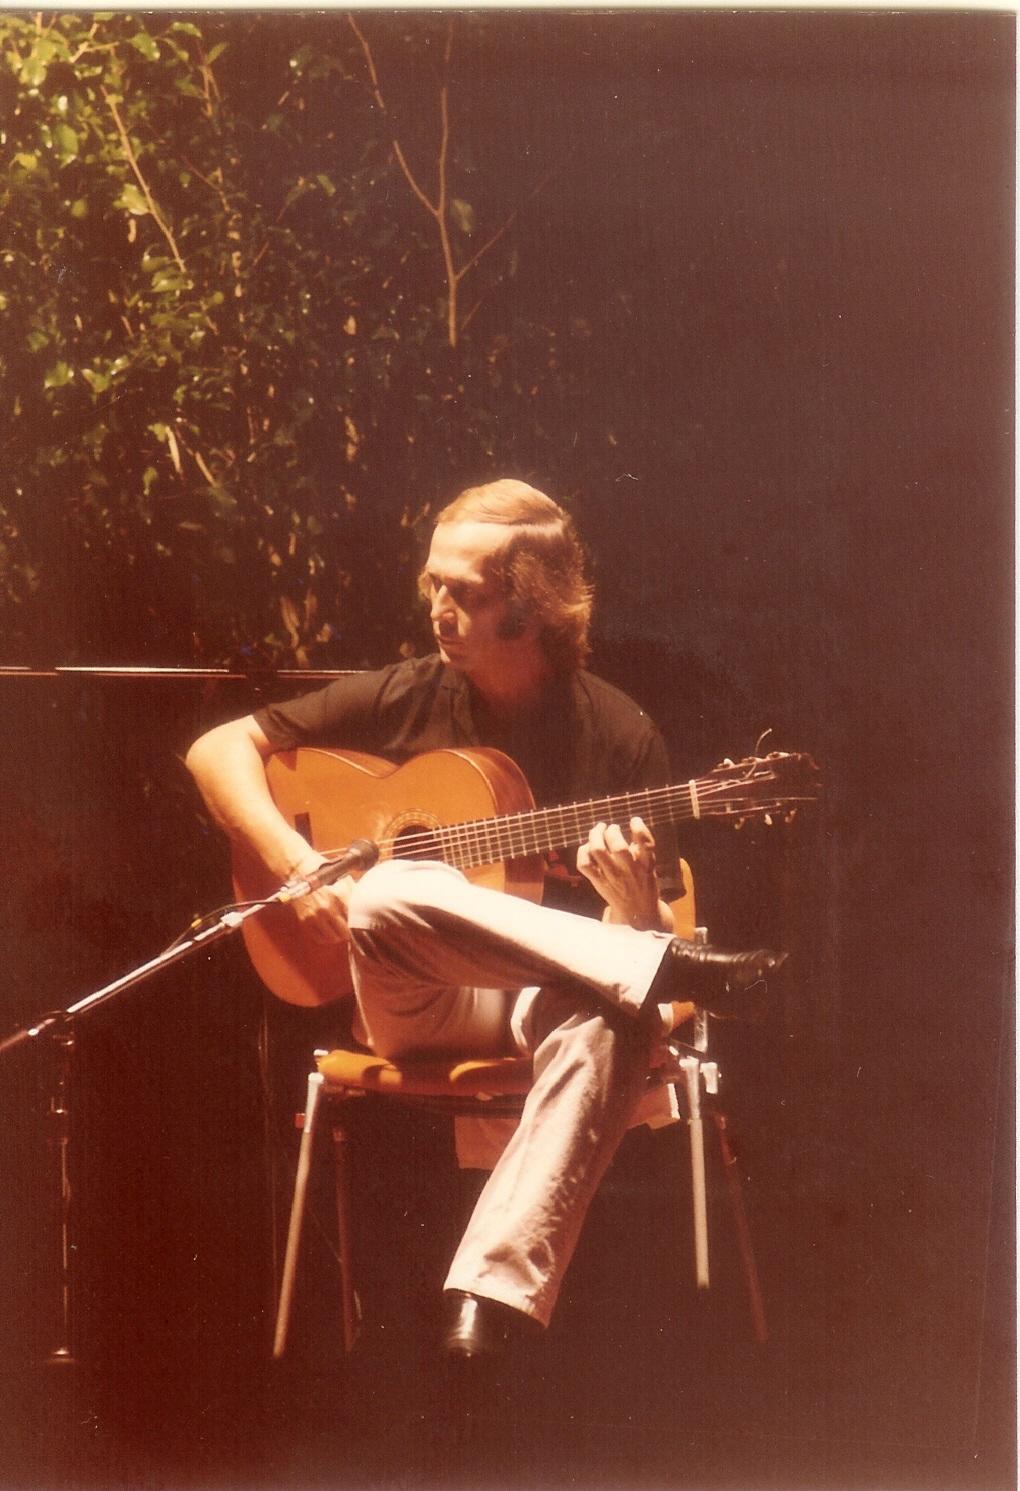 guitar trio john mclaughlin al di meola paco de lucia guest steve morse live at kiva. Black Bedroom Furniture Sets. Home Design Ideas